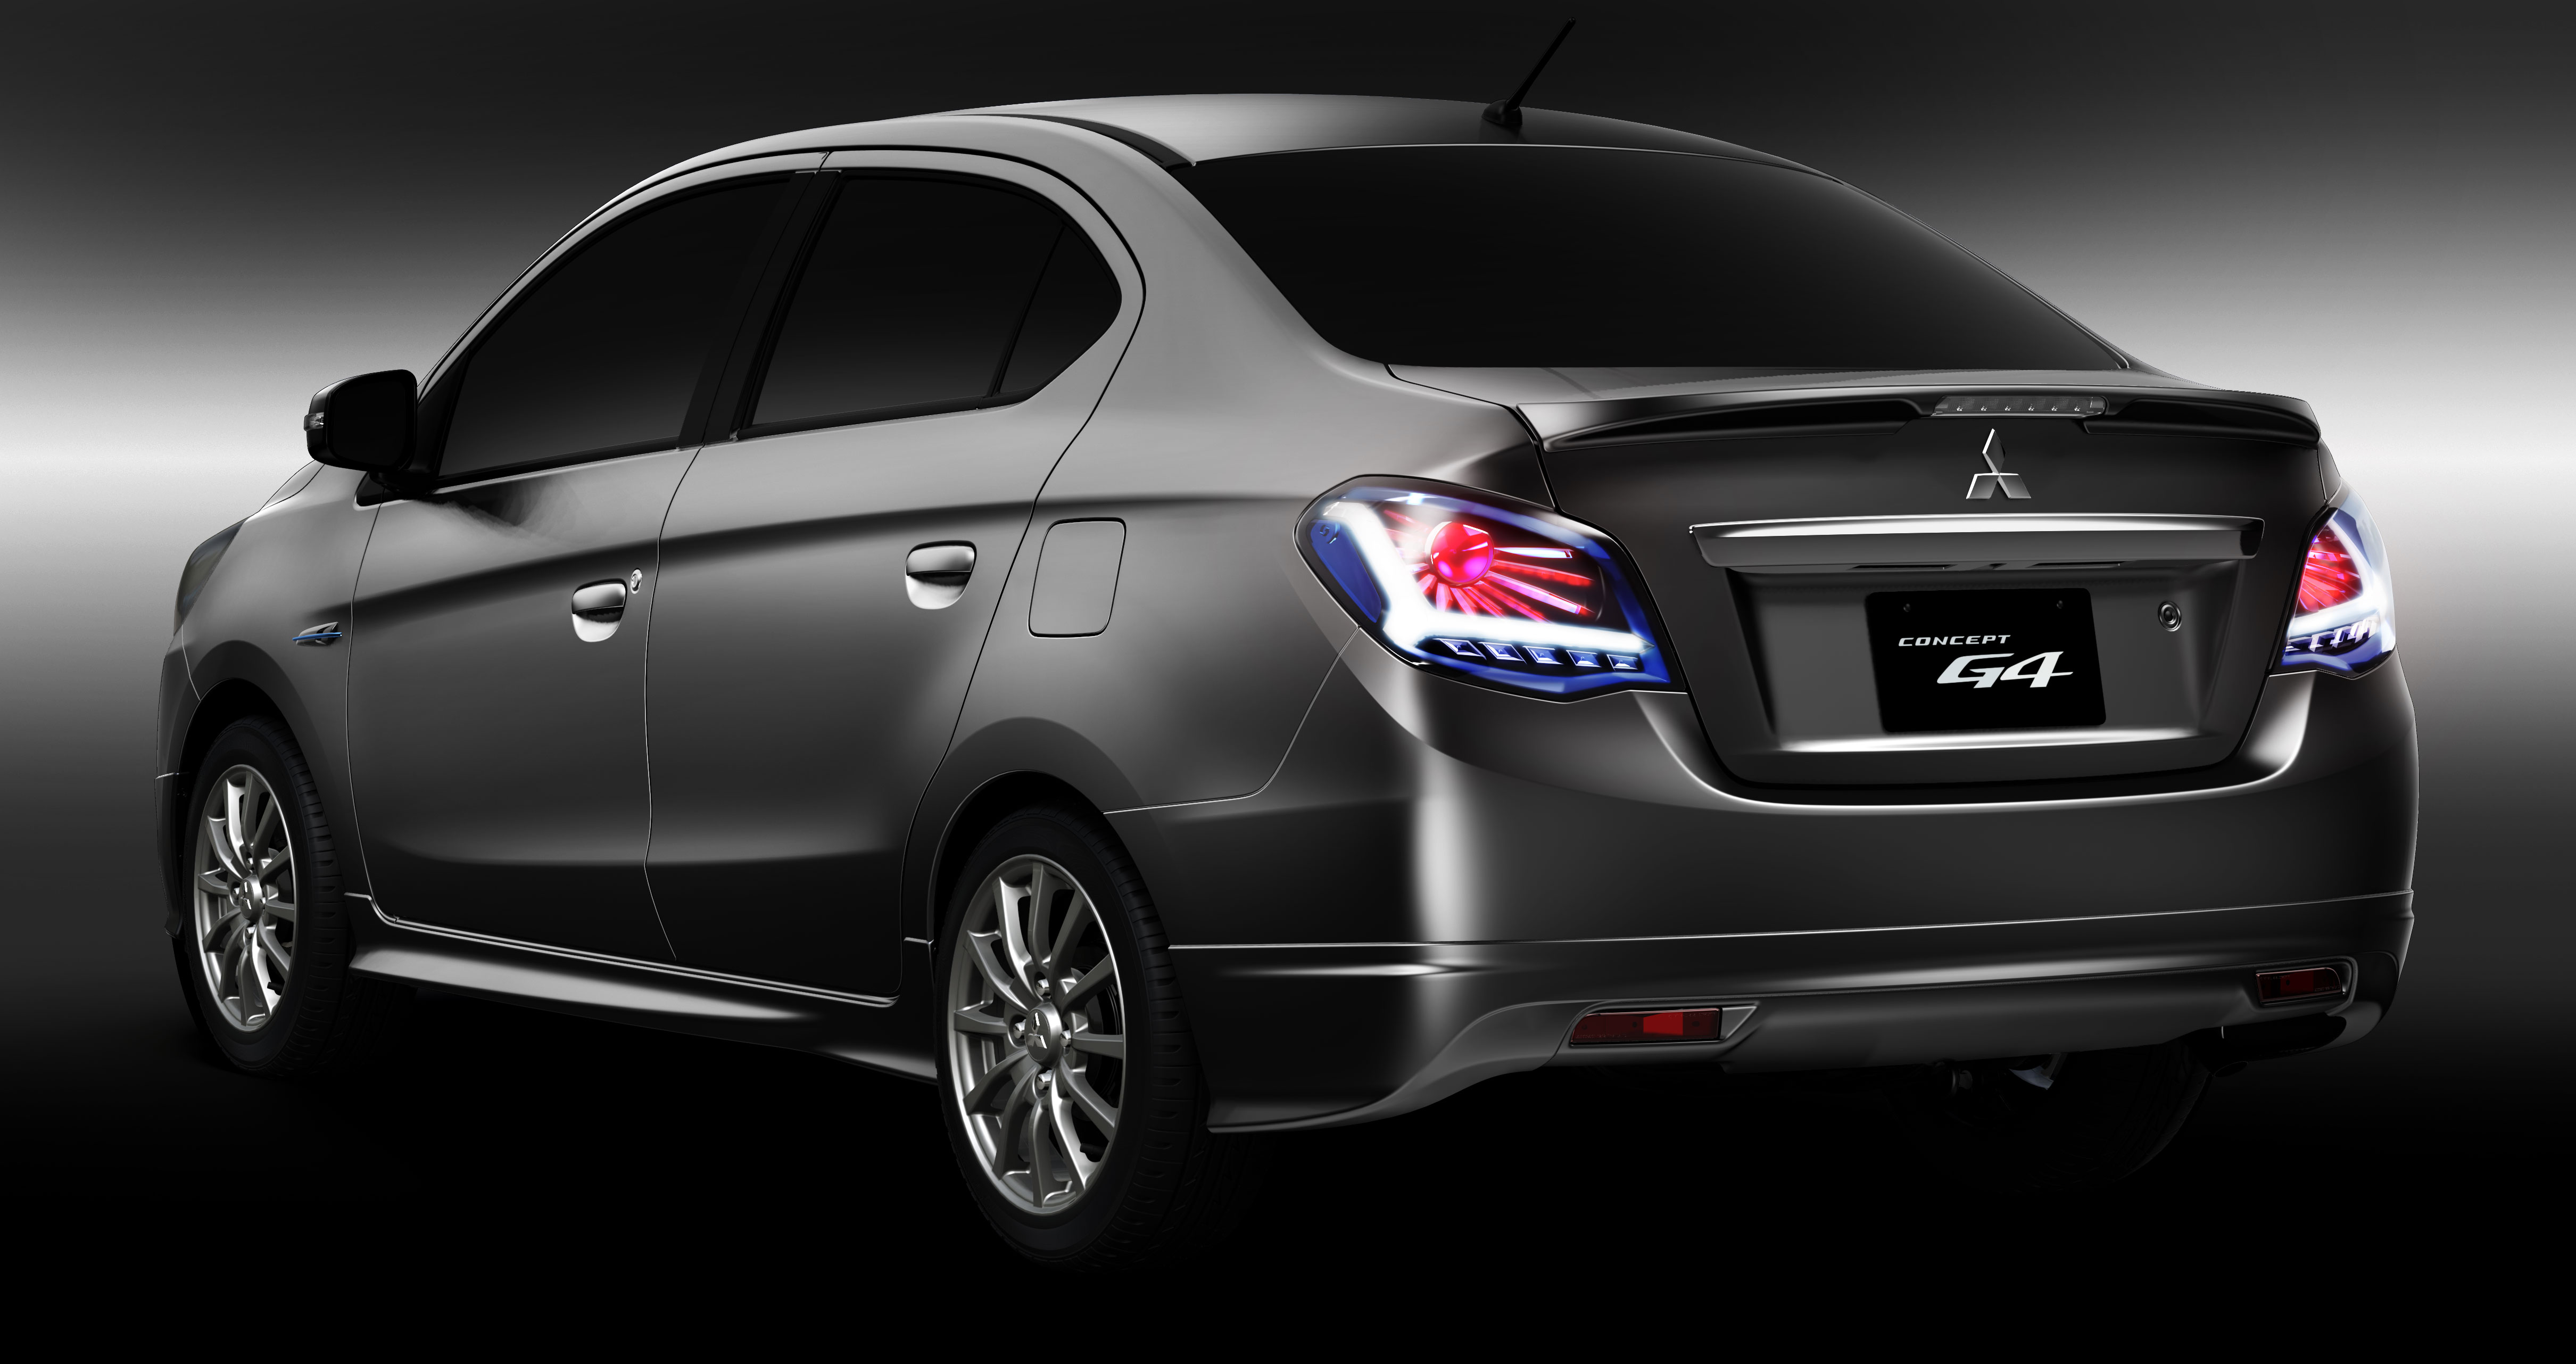 Sedan >> Mitsubishi Concept G4 previews Mirage sedan Paul Tan - Image 164949